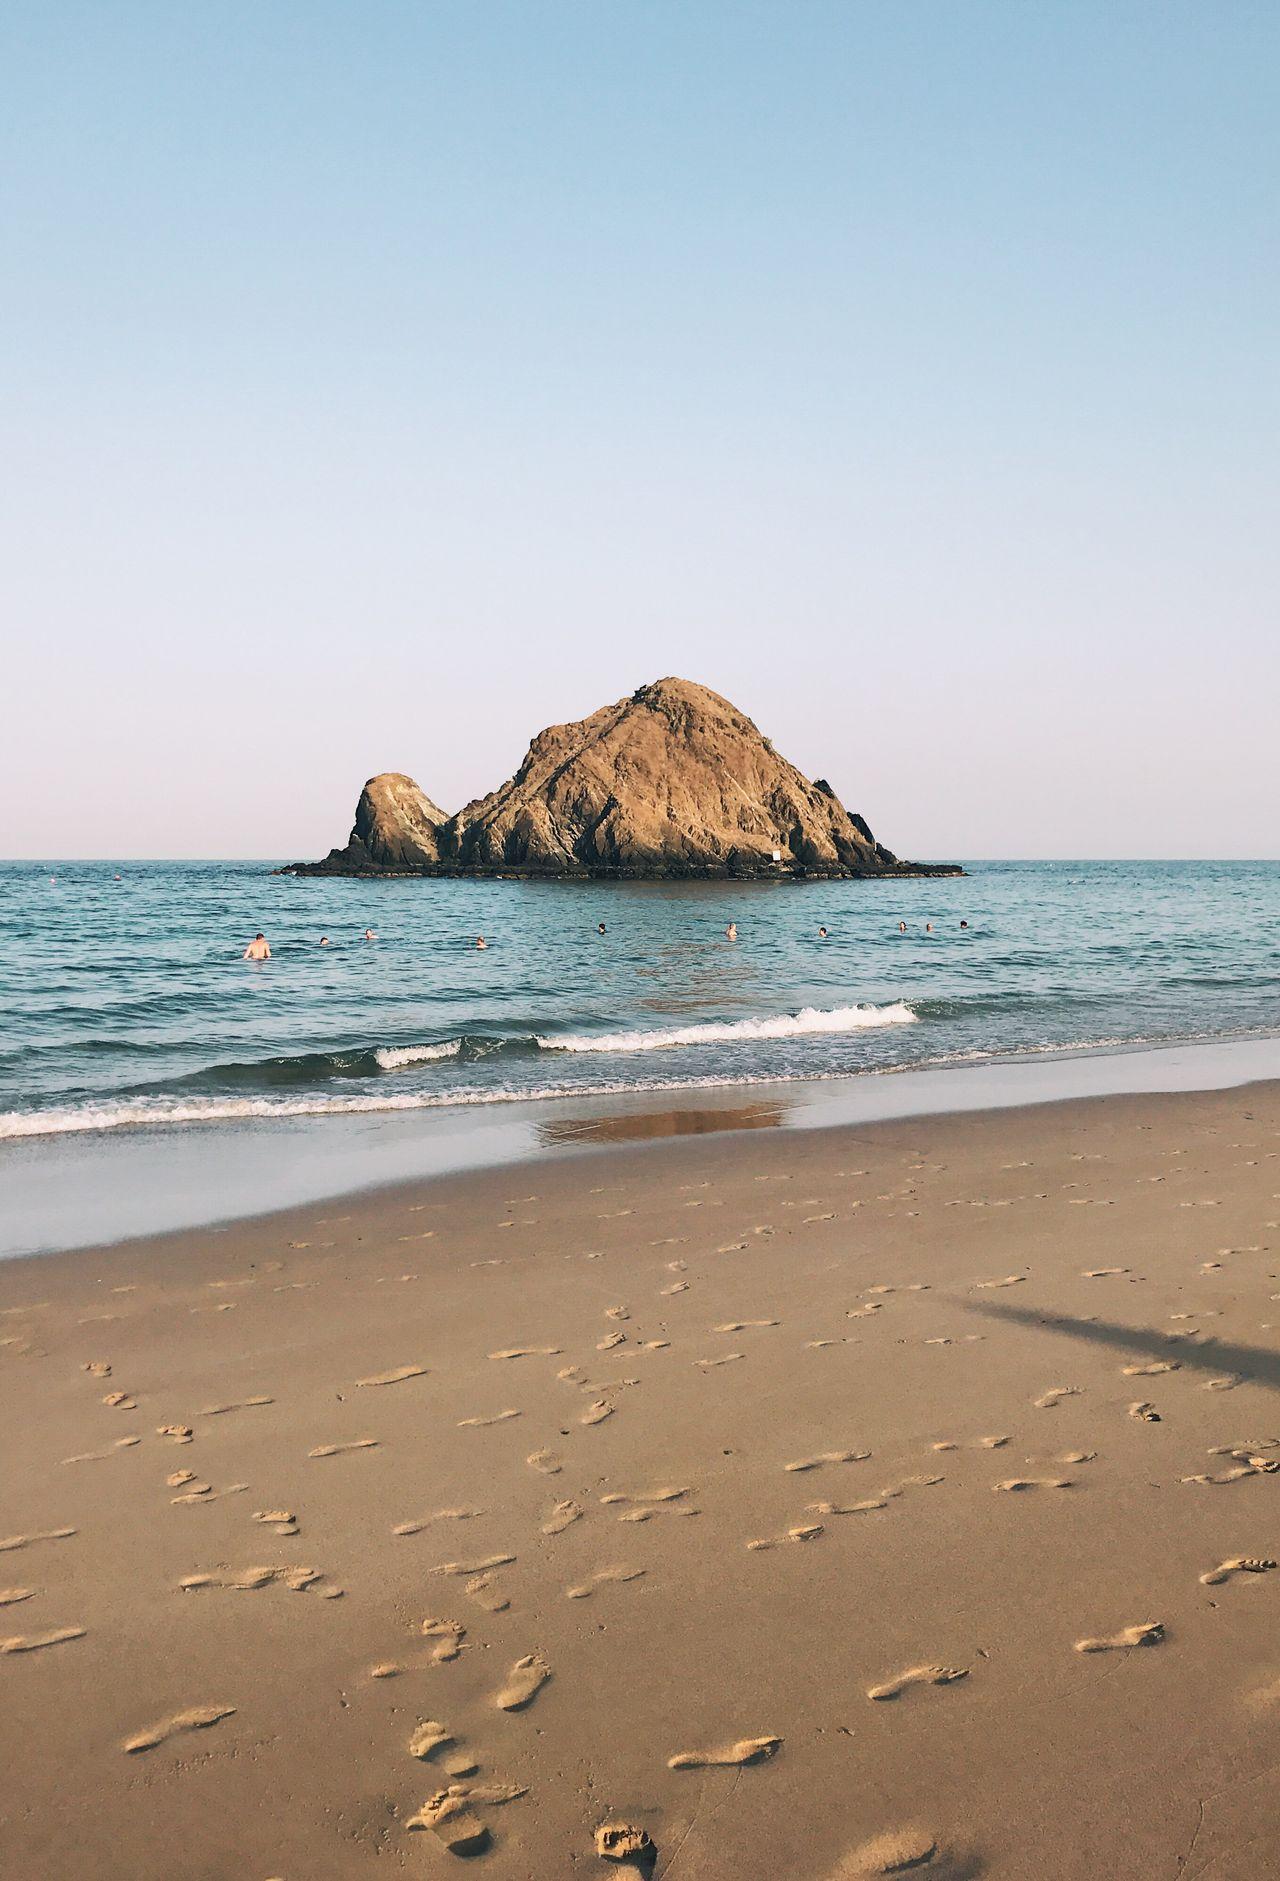 Beach Sea Sand EyeEmNewHere SnoopyIsland Fujairah Middle East